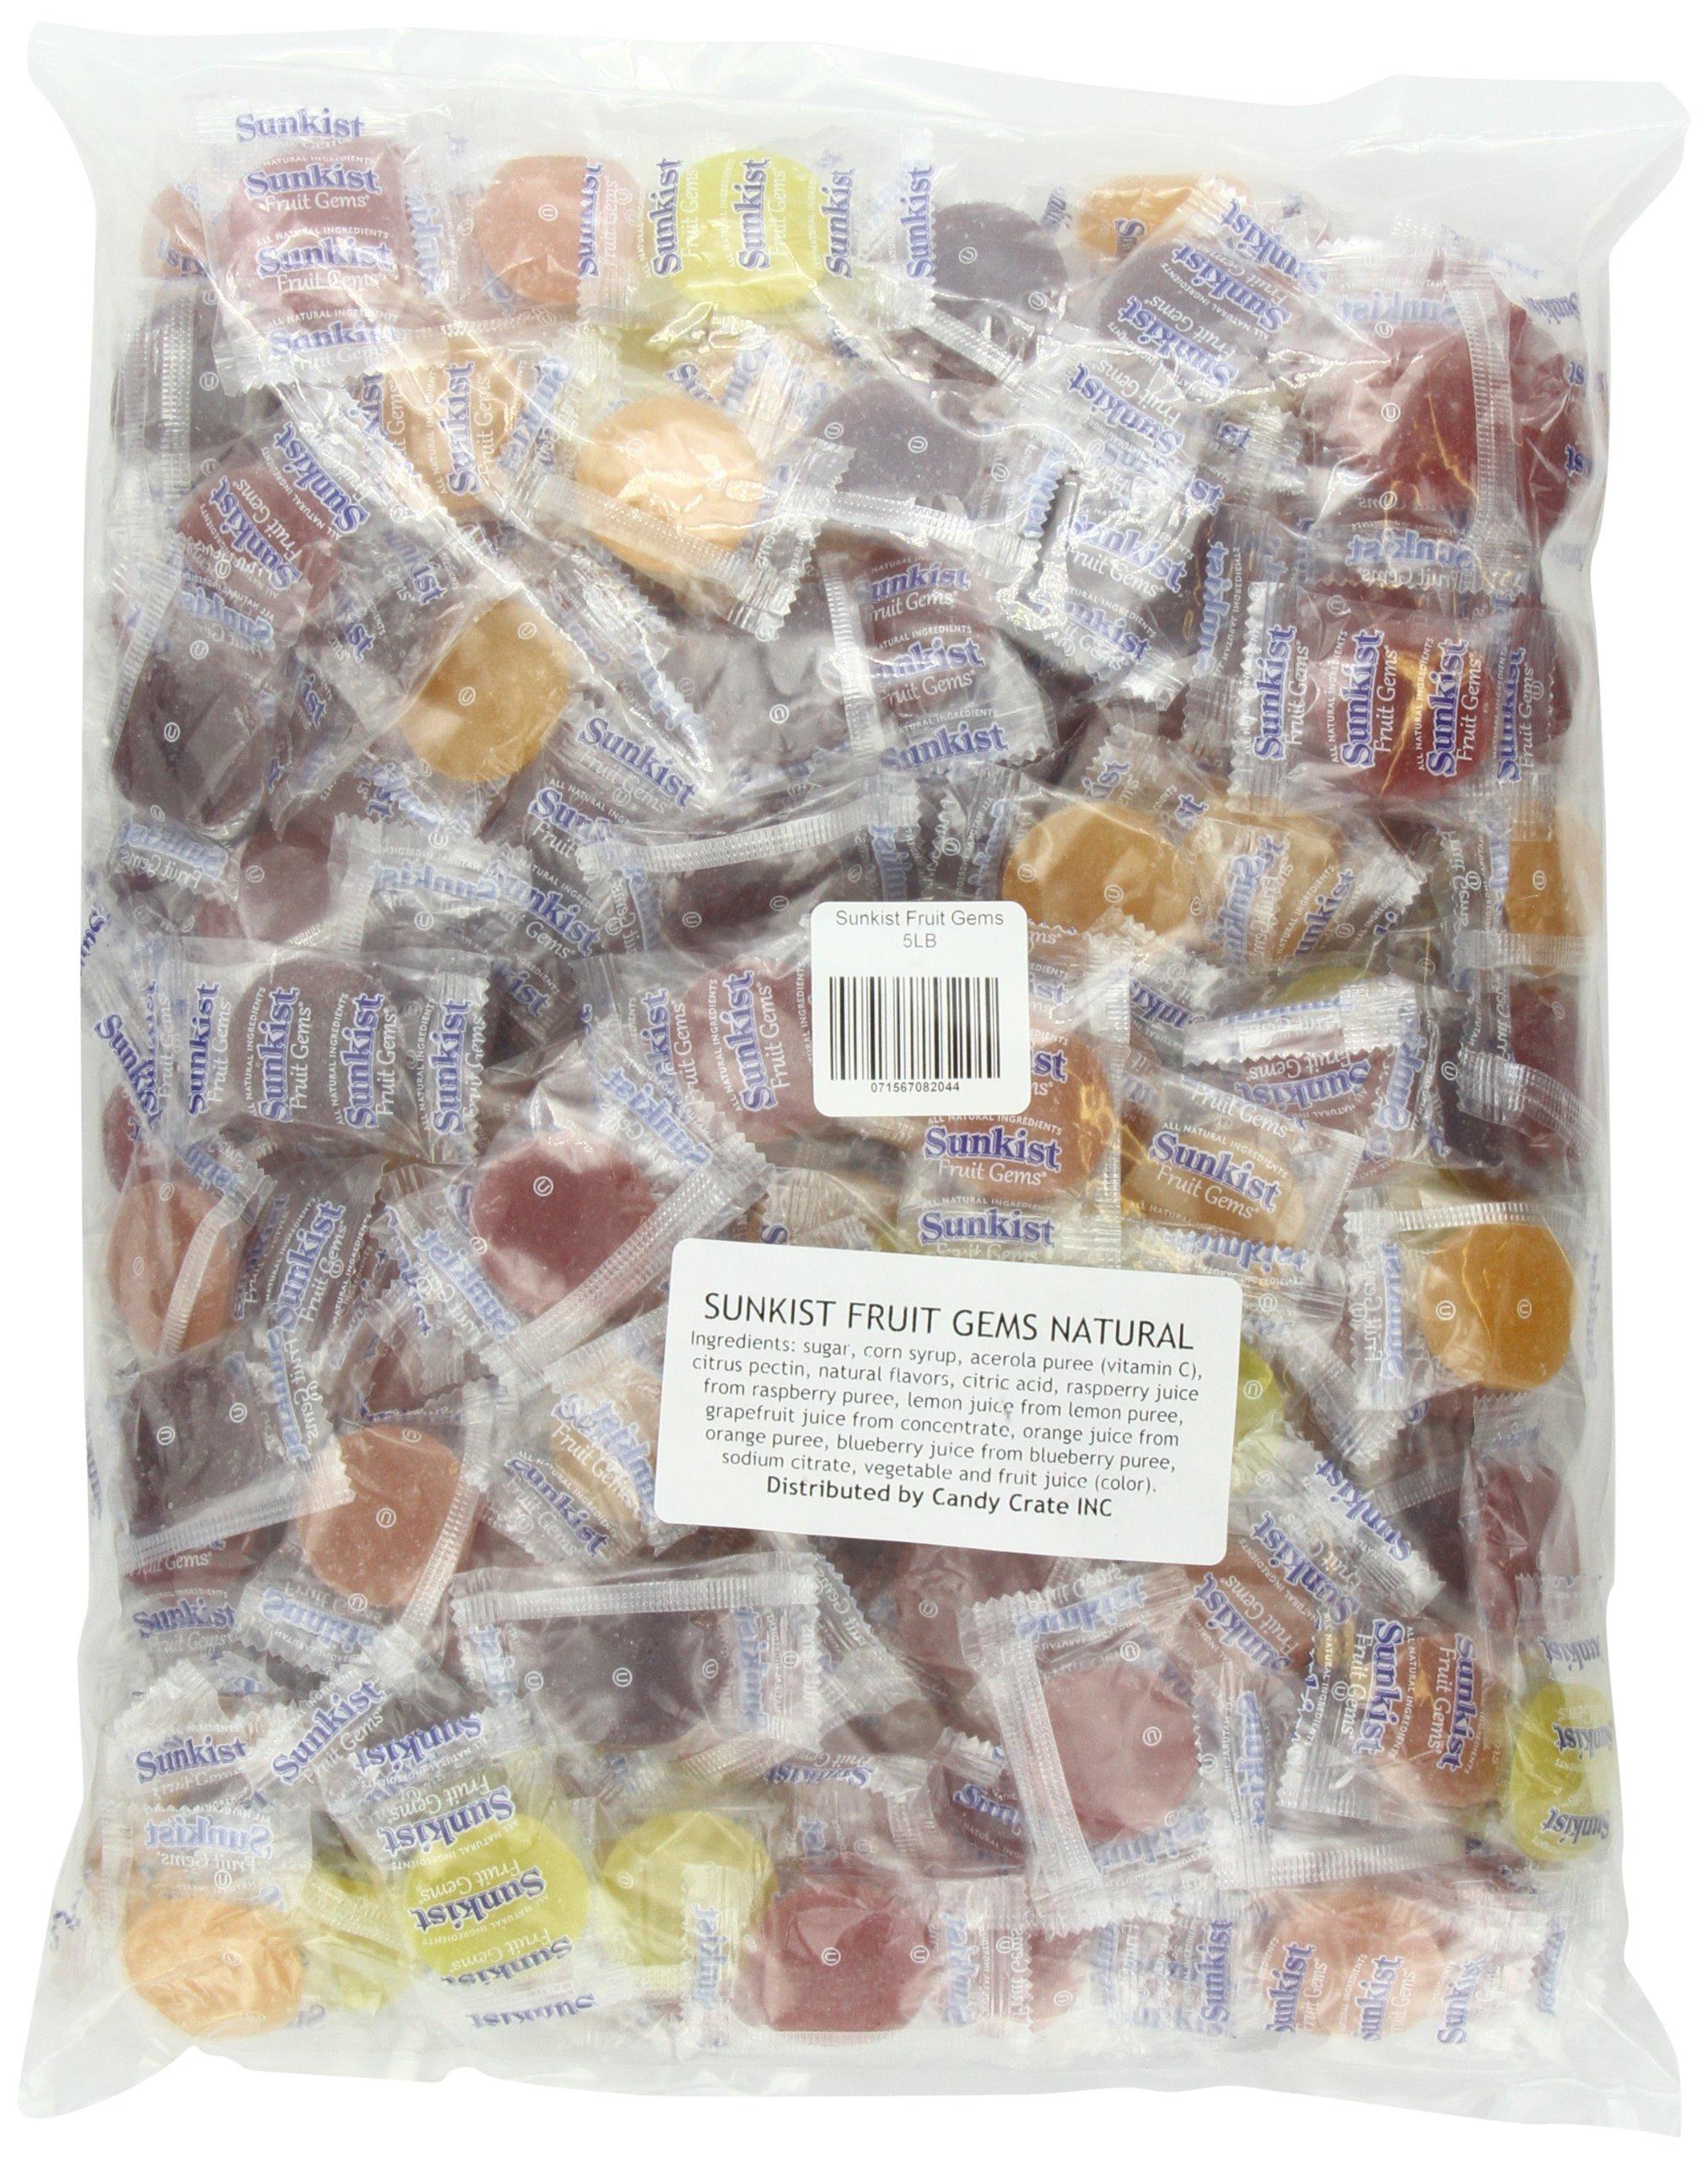 Sunkist Fruit Gems, 5-Pound Bag